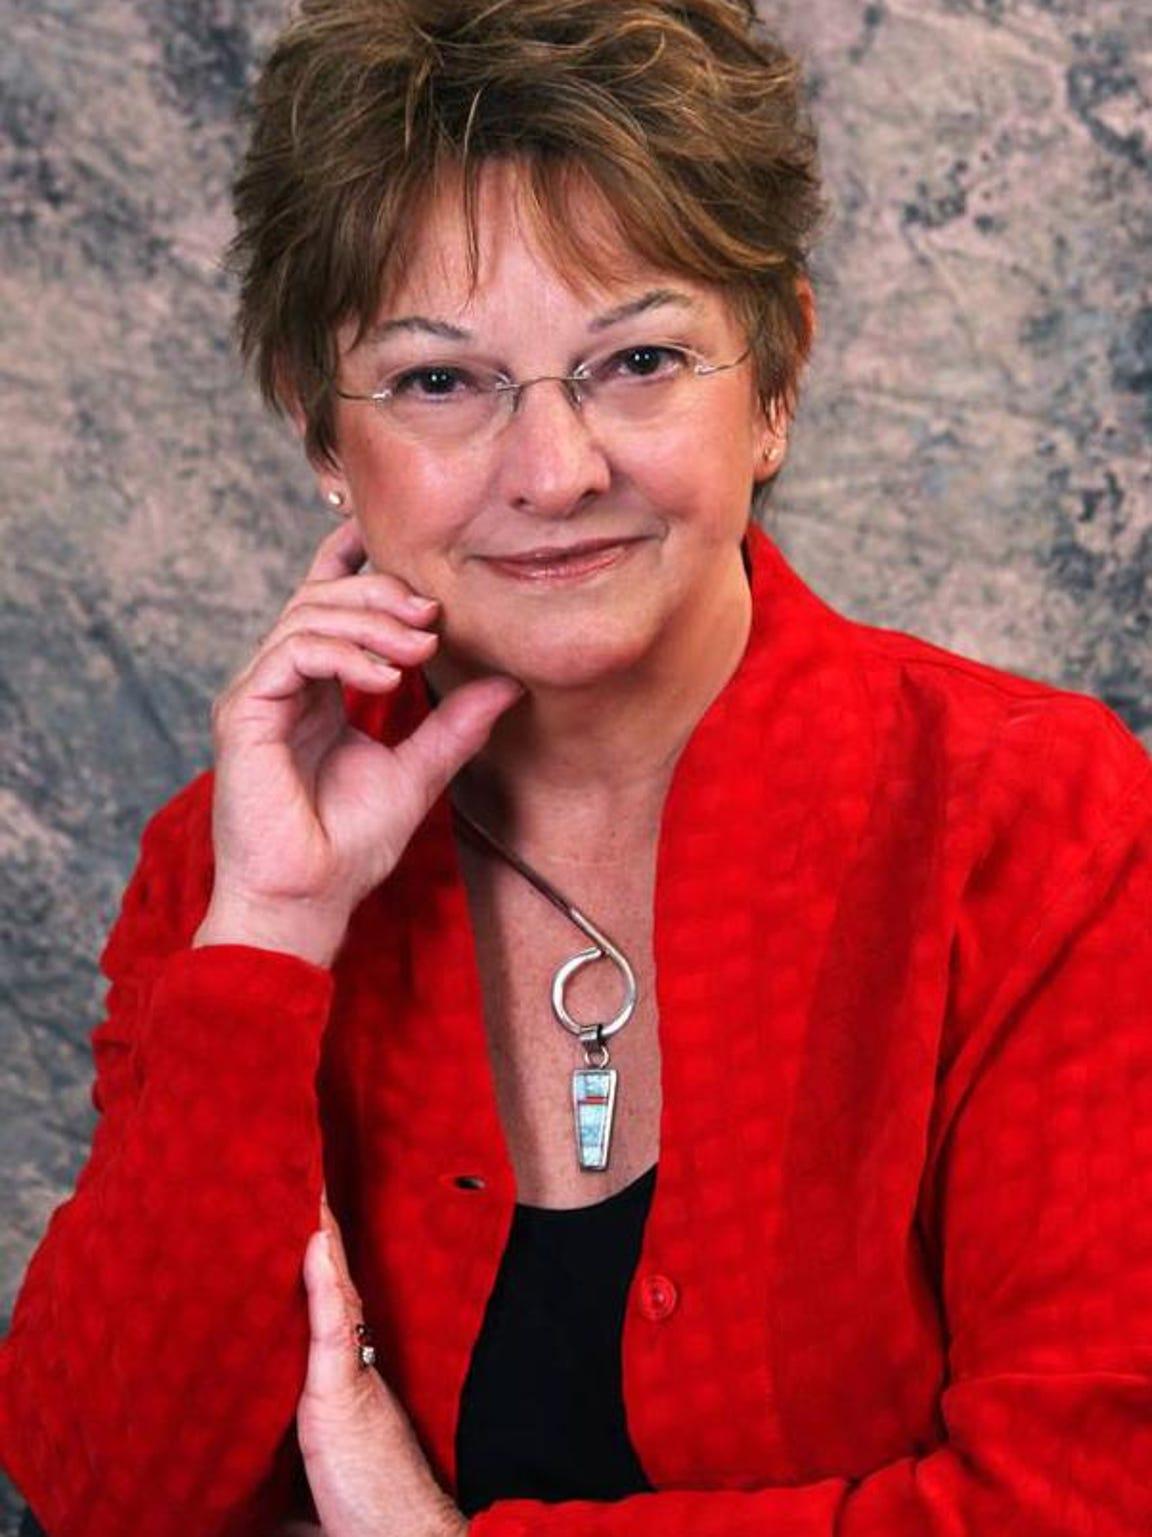 The life of Plymouth Notch spiritualist Achsa Sprague